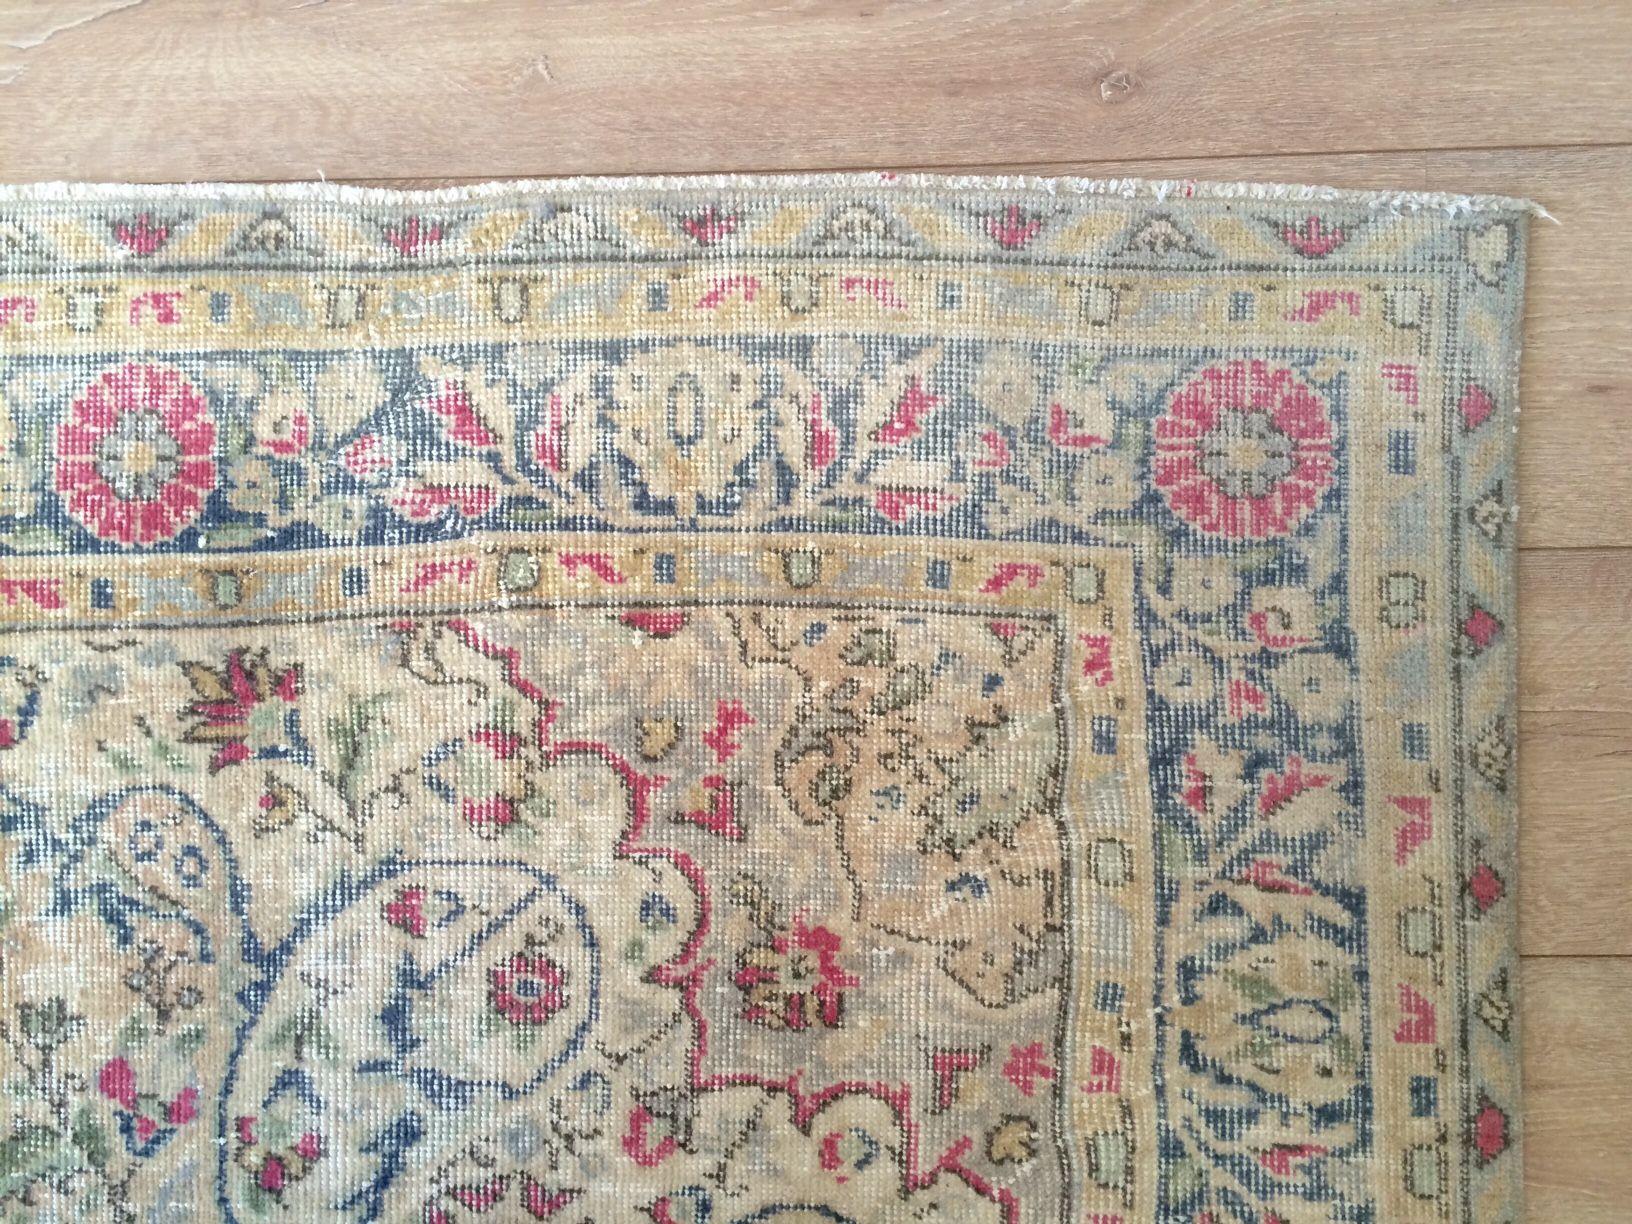 Sissy Boy Kussens : Sissy boy homeland recouloured vintage rug in pink grey and